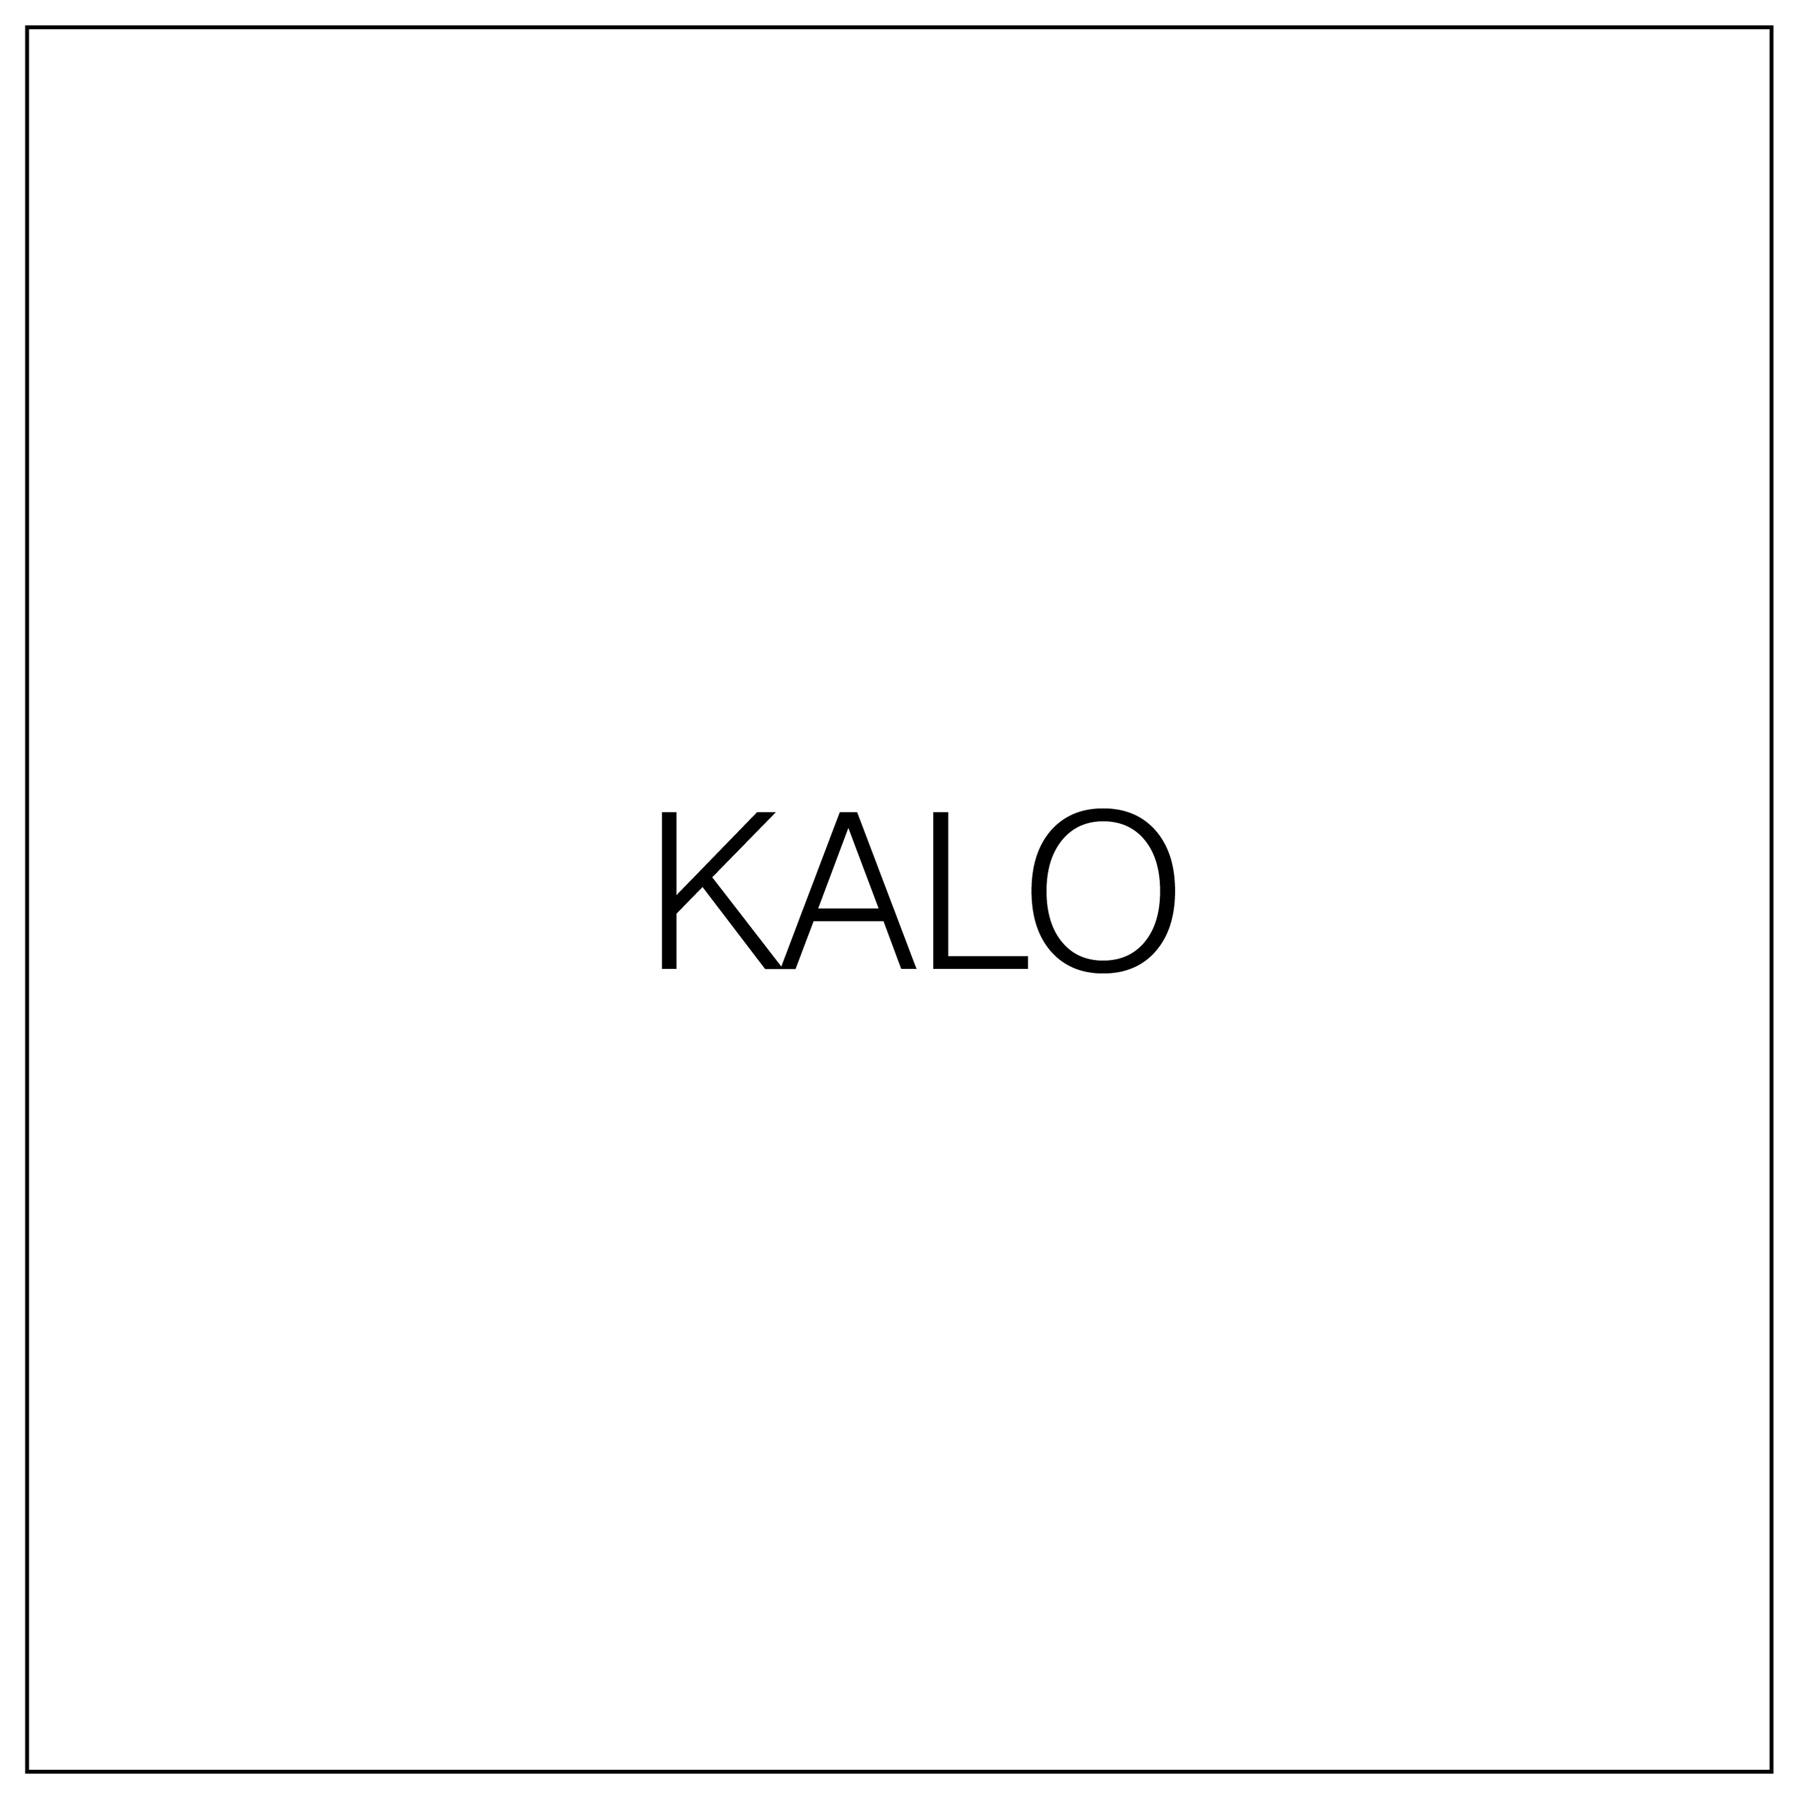 name kalo profile kalo is an architecture and design studio